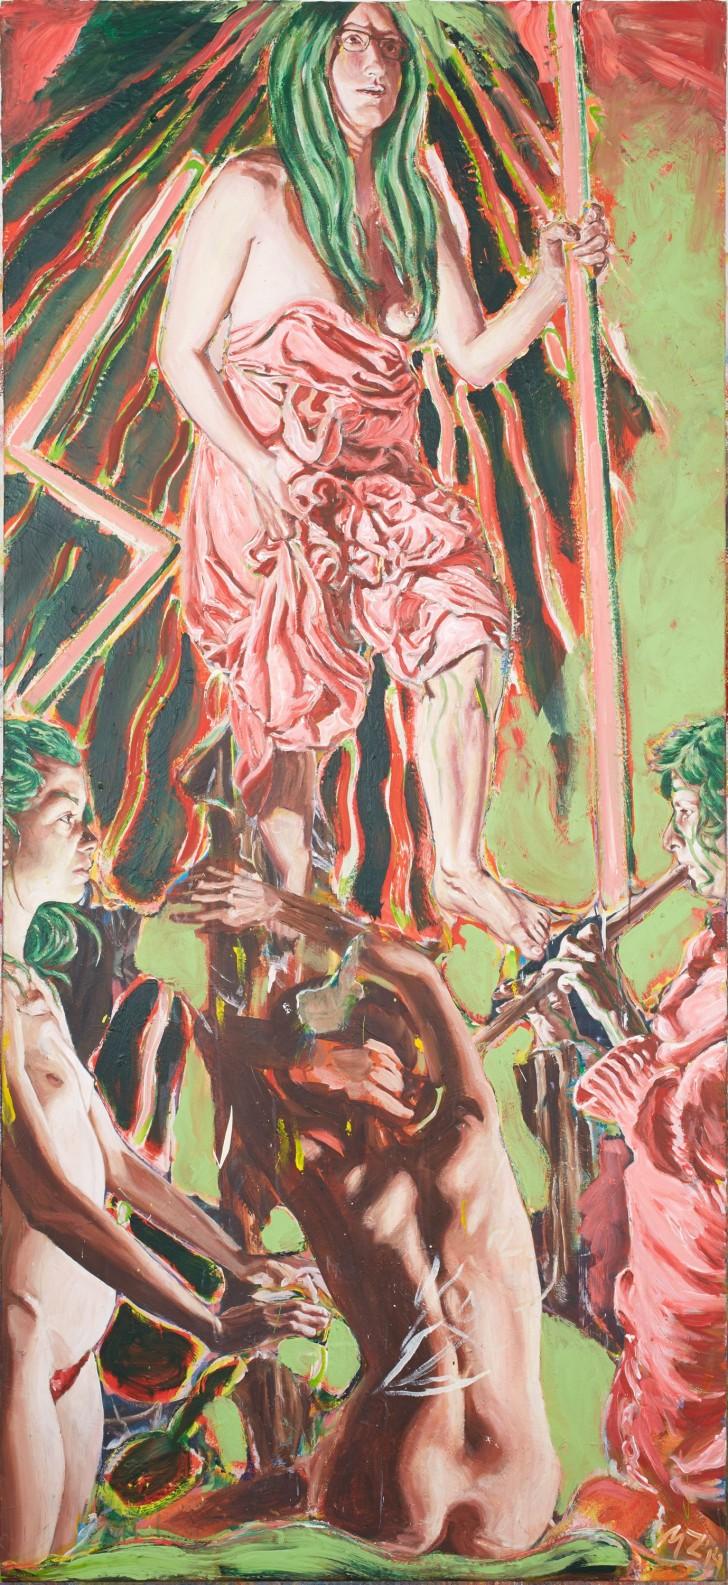 Martin Ziegler, Offenbarung, 200x160 cm, 2014, Acryl auf Leinwand